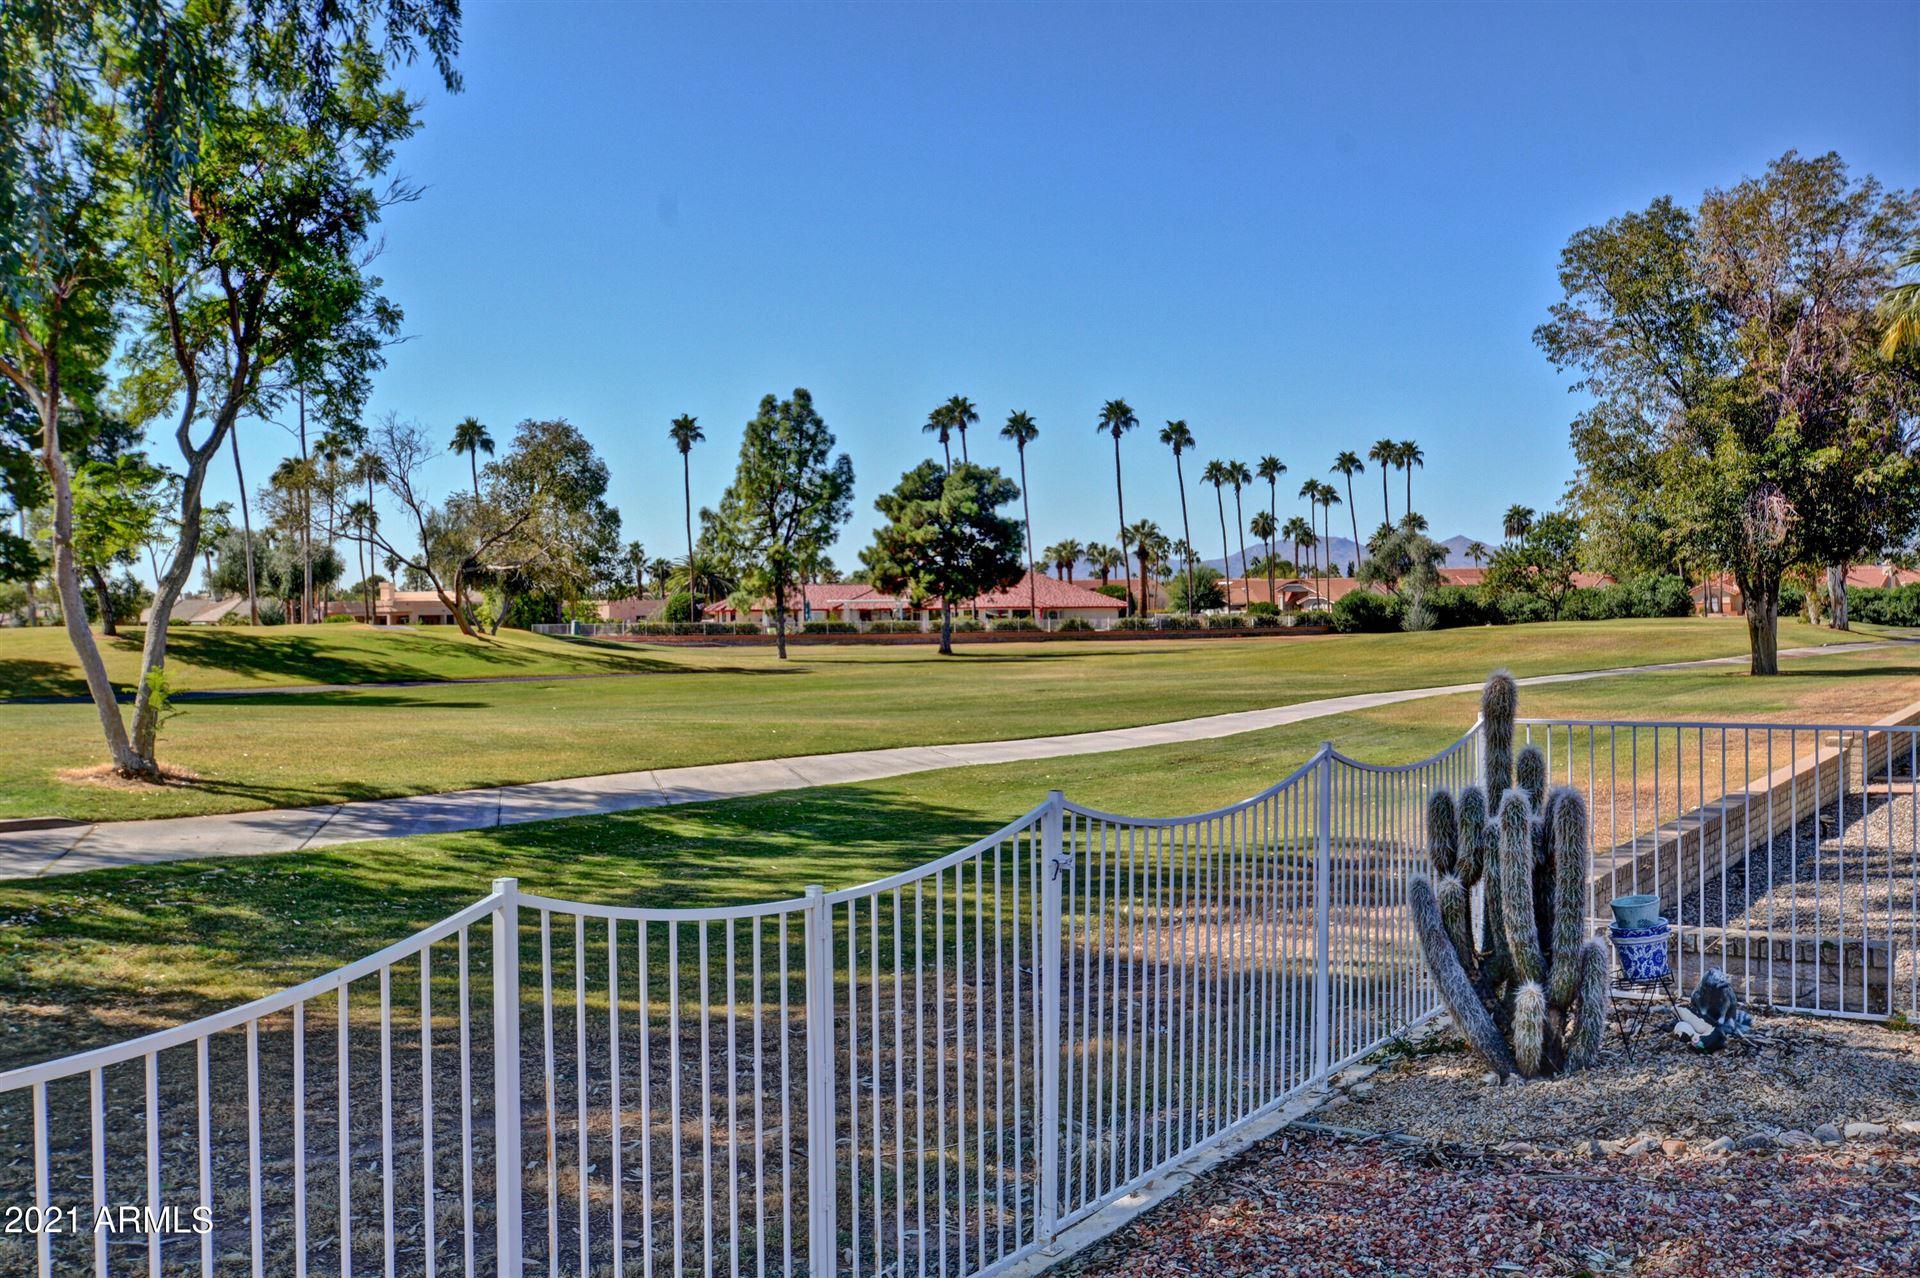 Photo of 13431 W GABLE HILL Drive, Sun City West, AZ 85375 (MLS # 6307178)